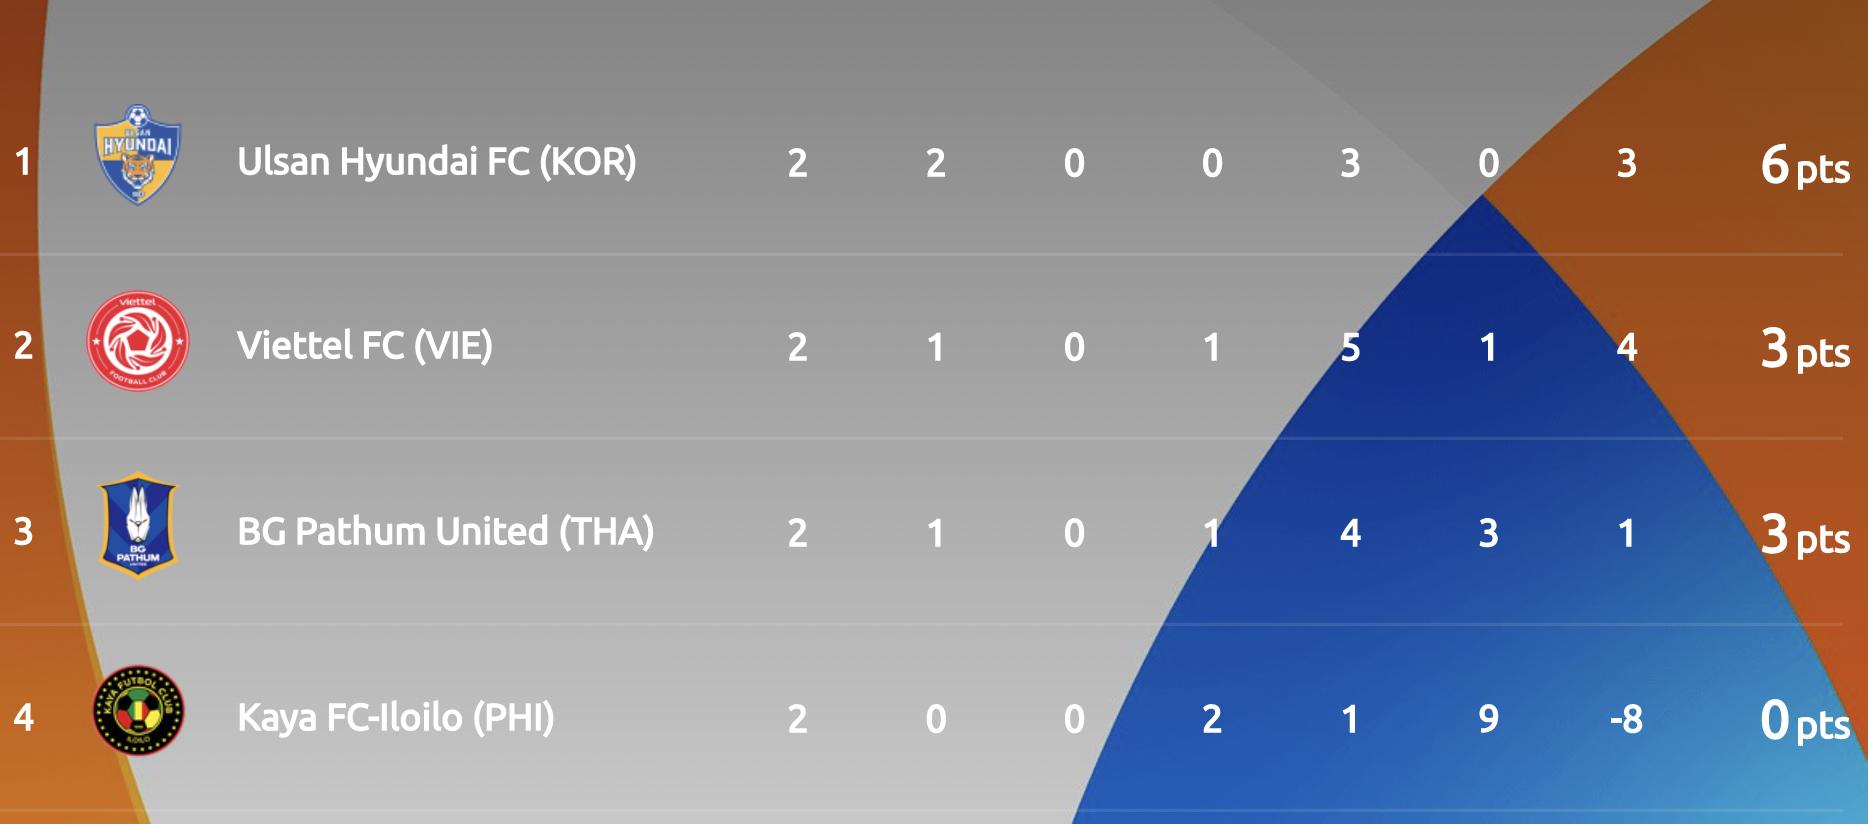 Peringkat Grup F setelah dua putaran pertandingan Liga Champions AFC 2021.